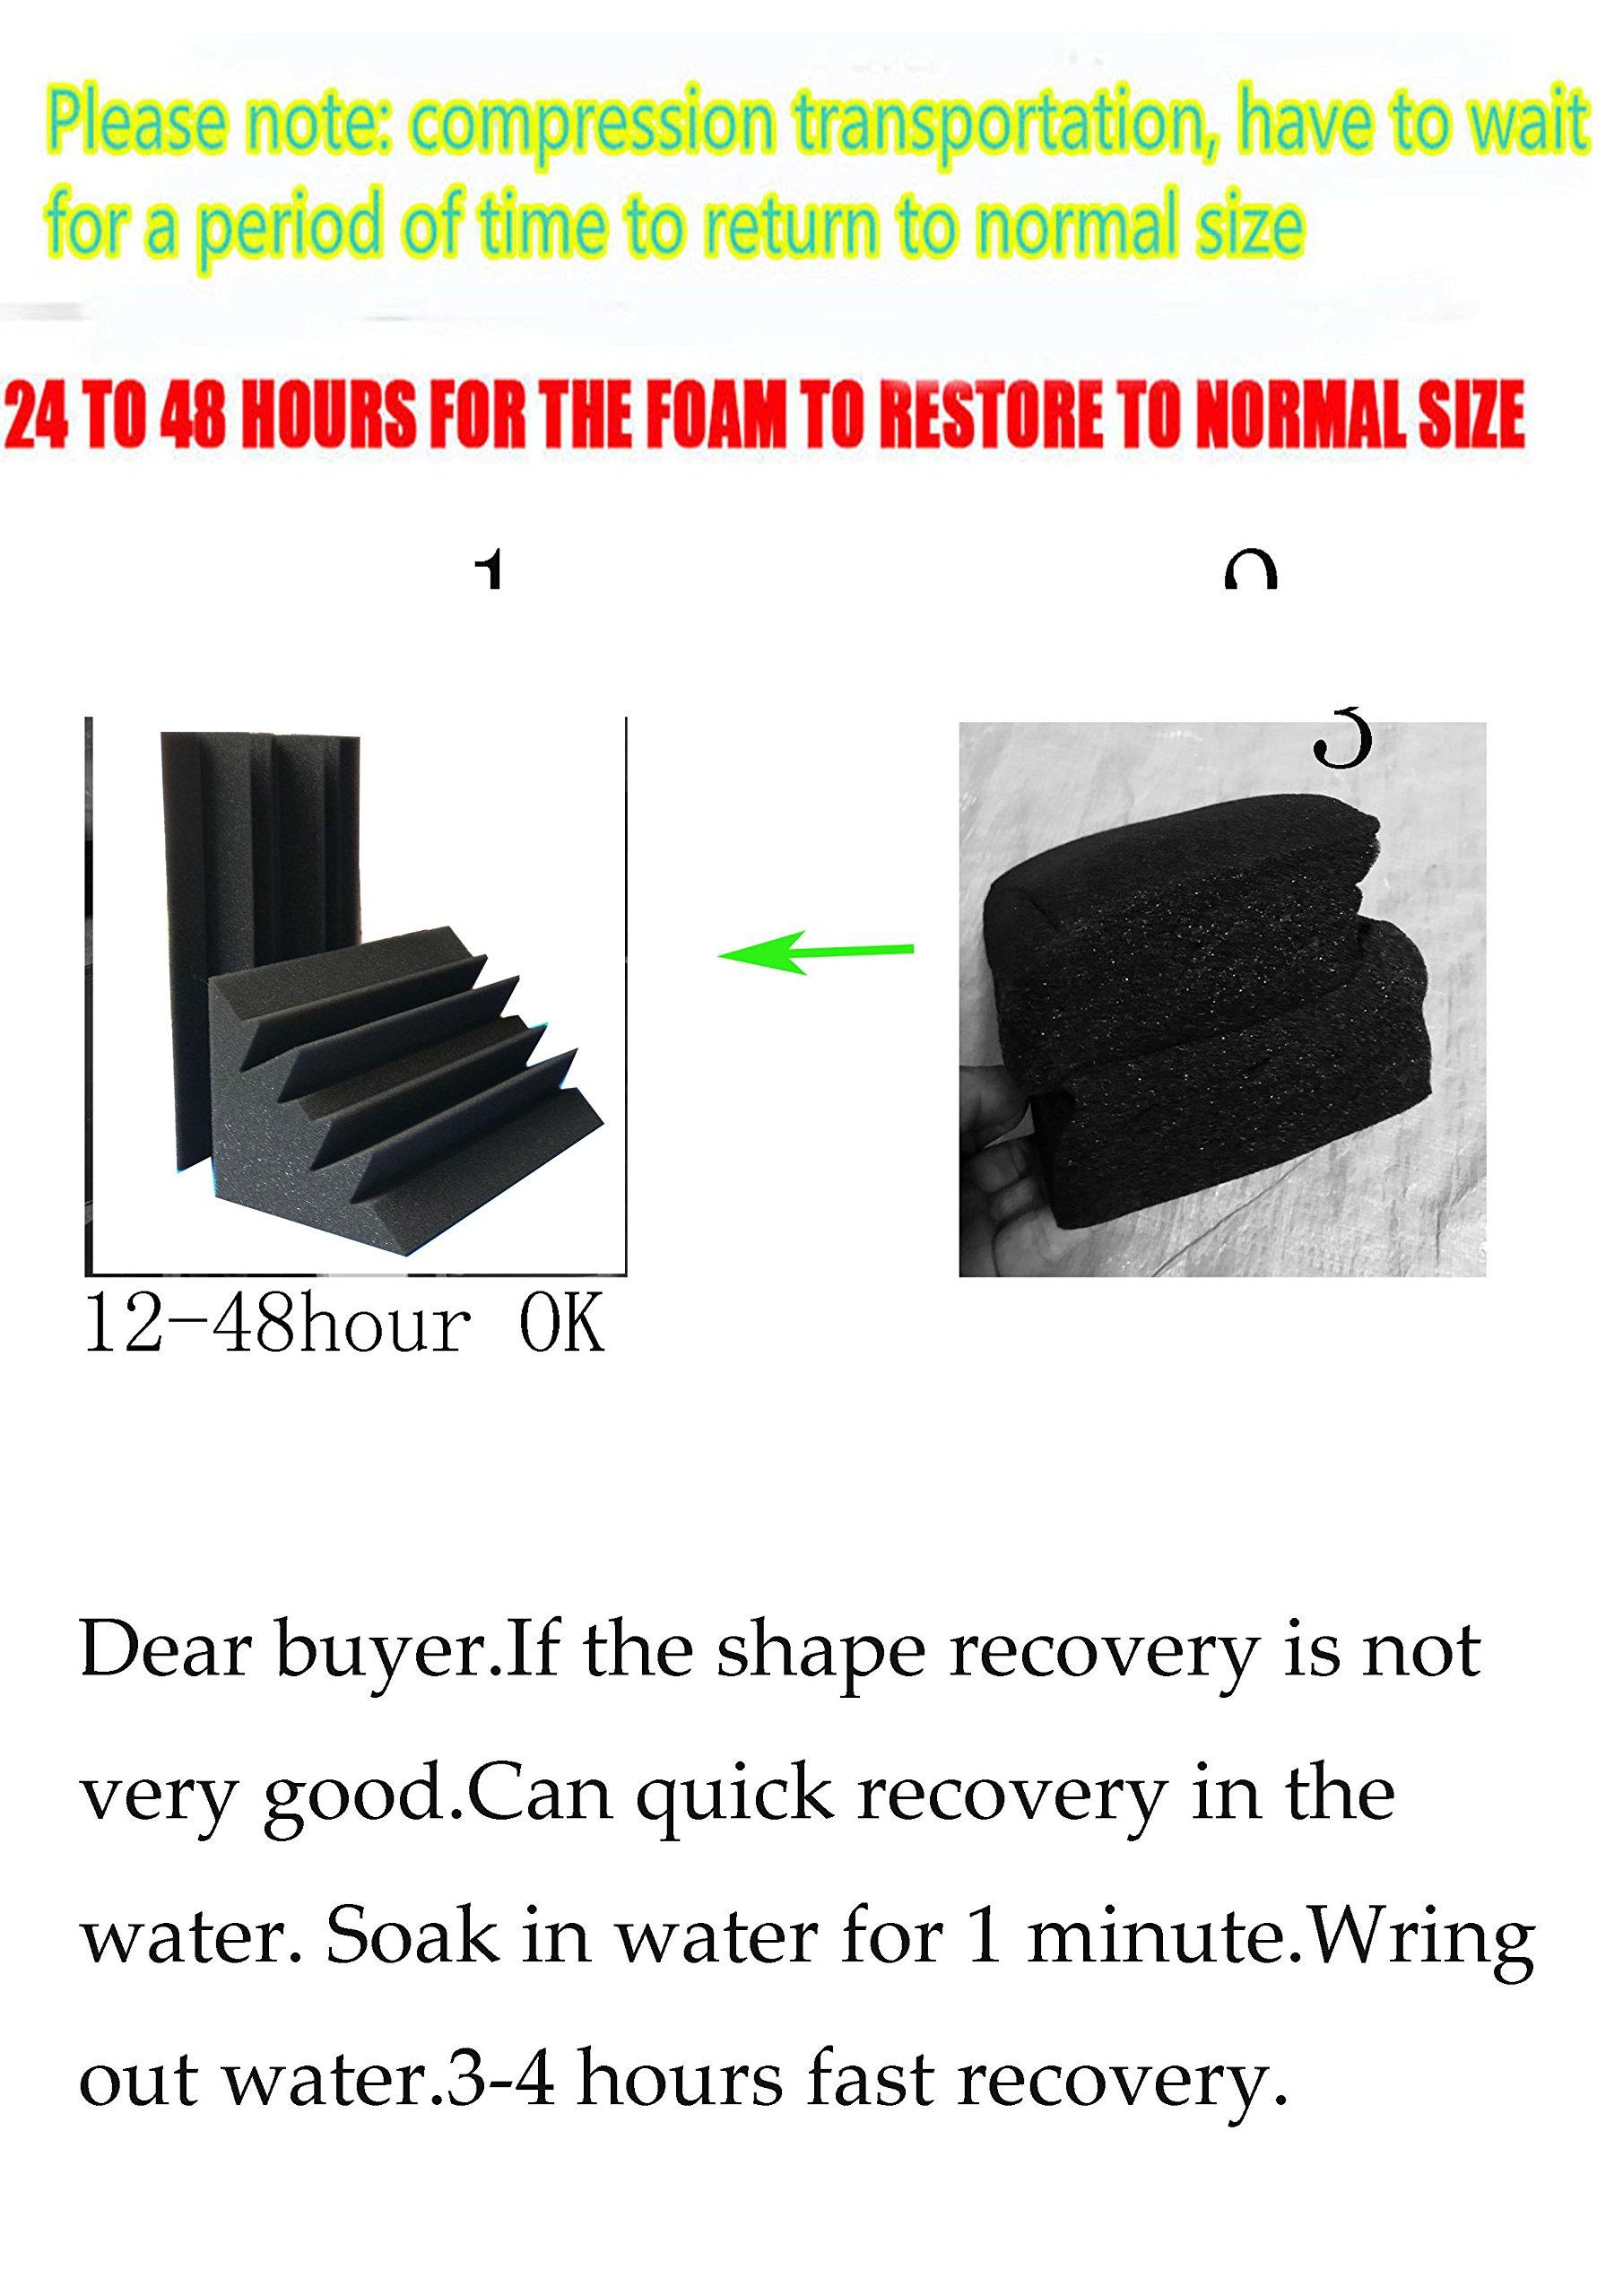 Xin&LG 8 PCS 4.6''x4.6''x9.4'' Sale Acoustic Foam Black Bass trap Soundproof foam